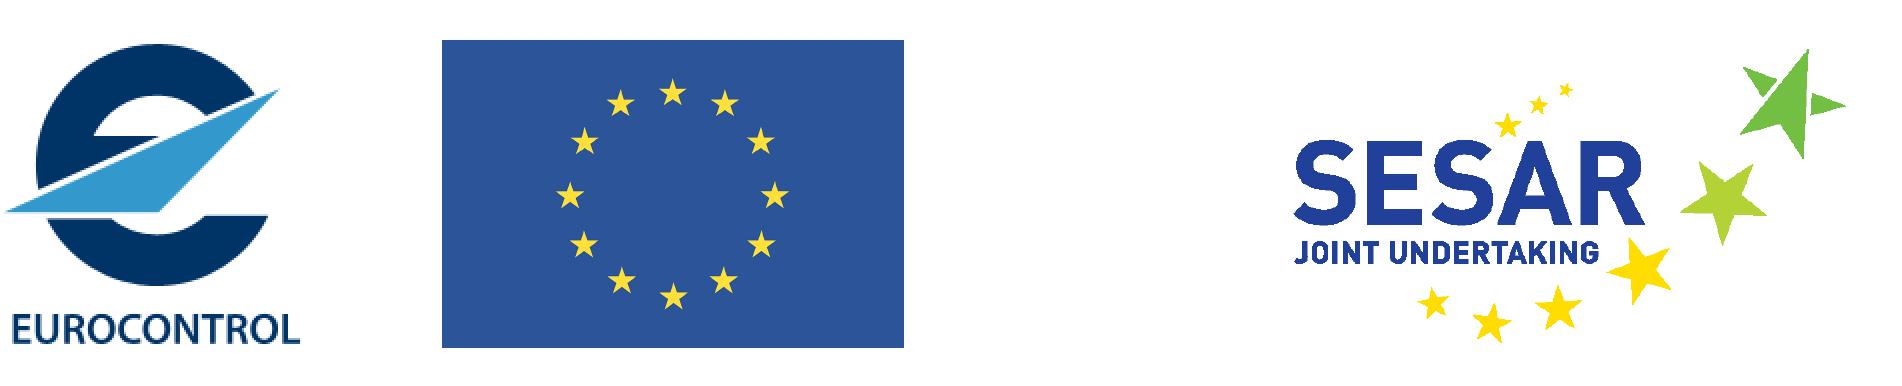 Eurocontrol, EU, Sesar Logo